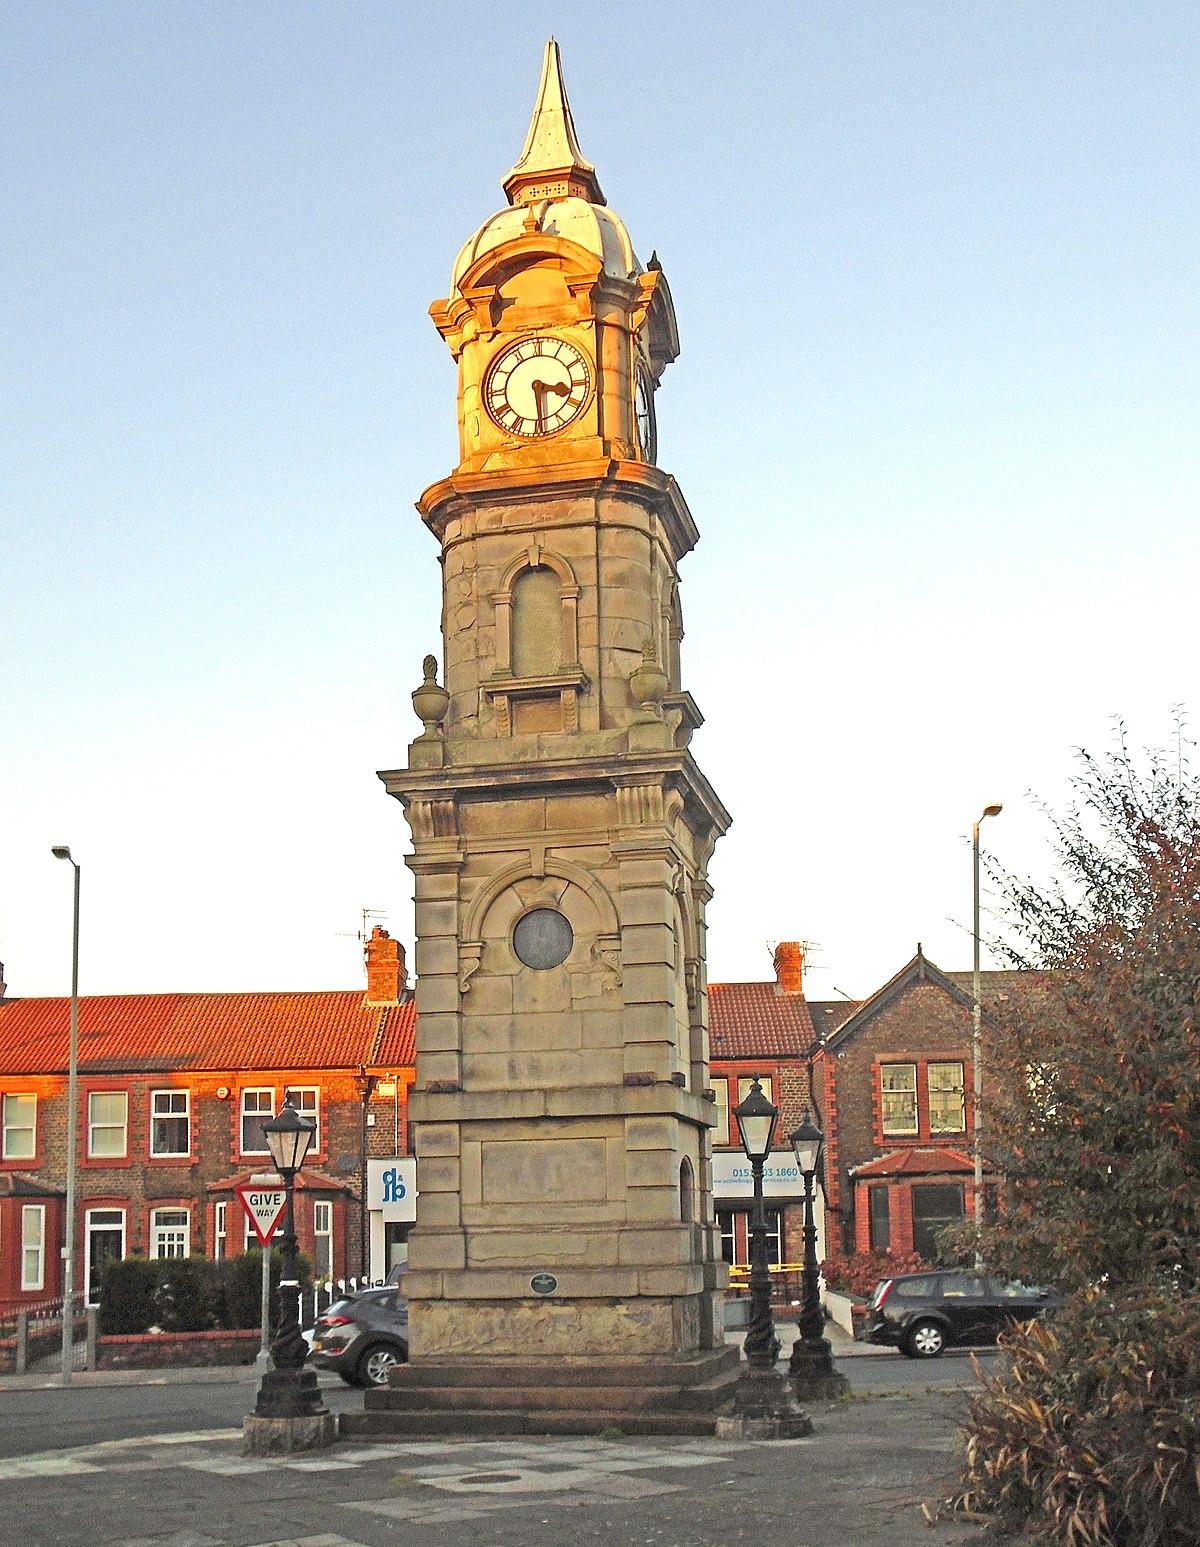 Picton Clock Tower Wikipedia